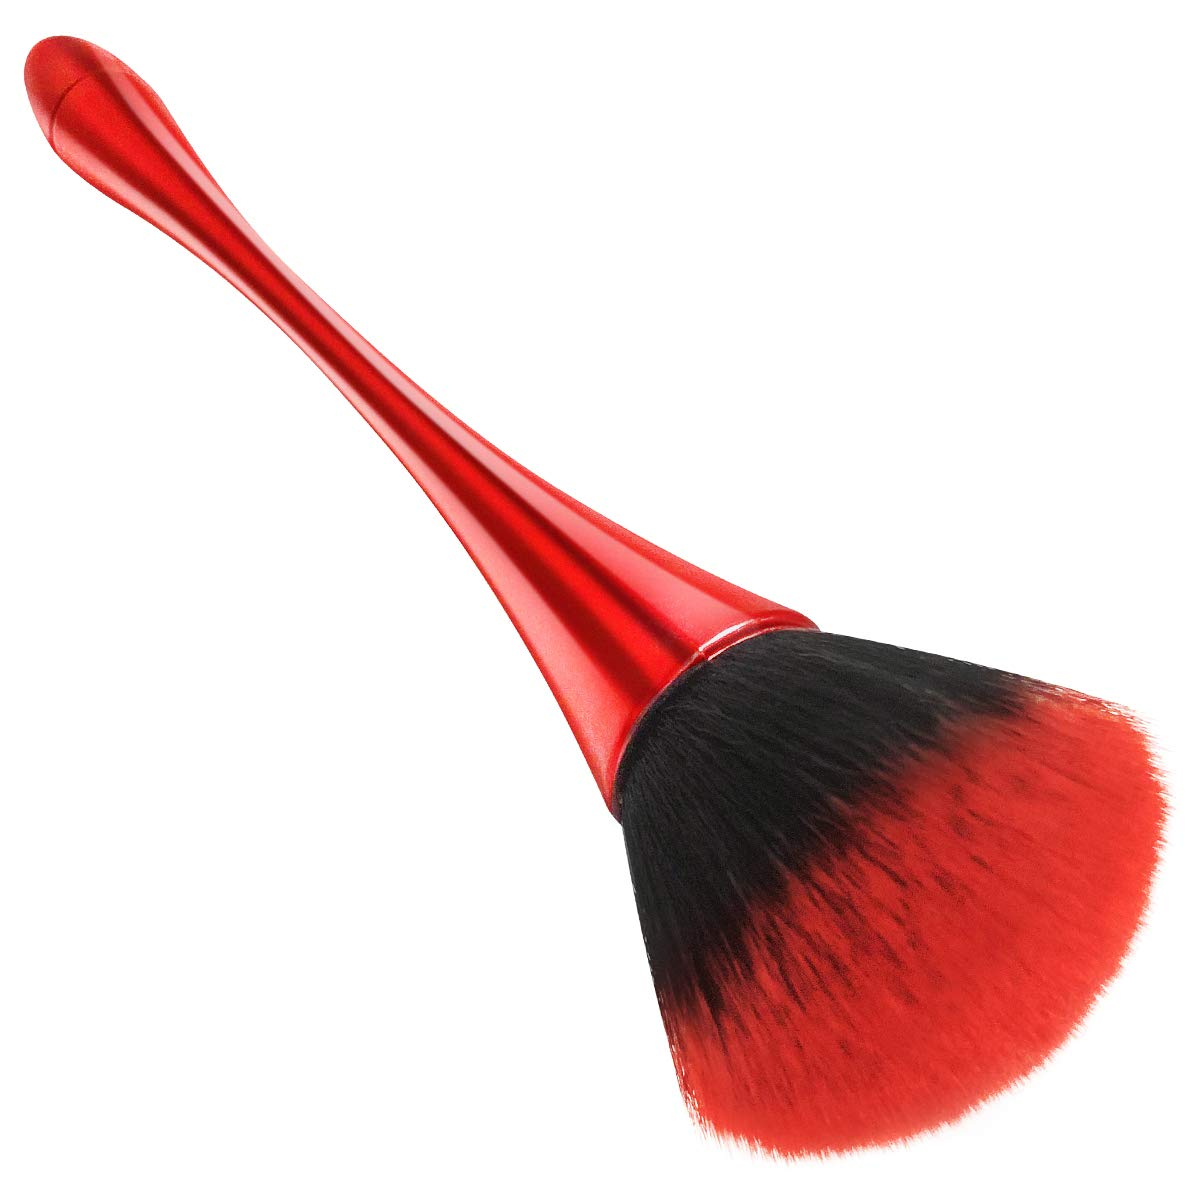 Super Large Mineral Powder Brush S Kabuki Omaha Mall Bronzer Makeup Cheap bargain